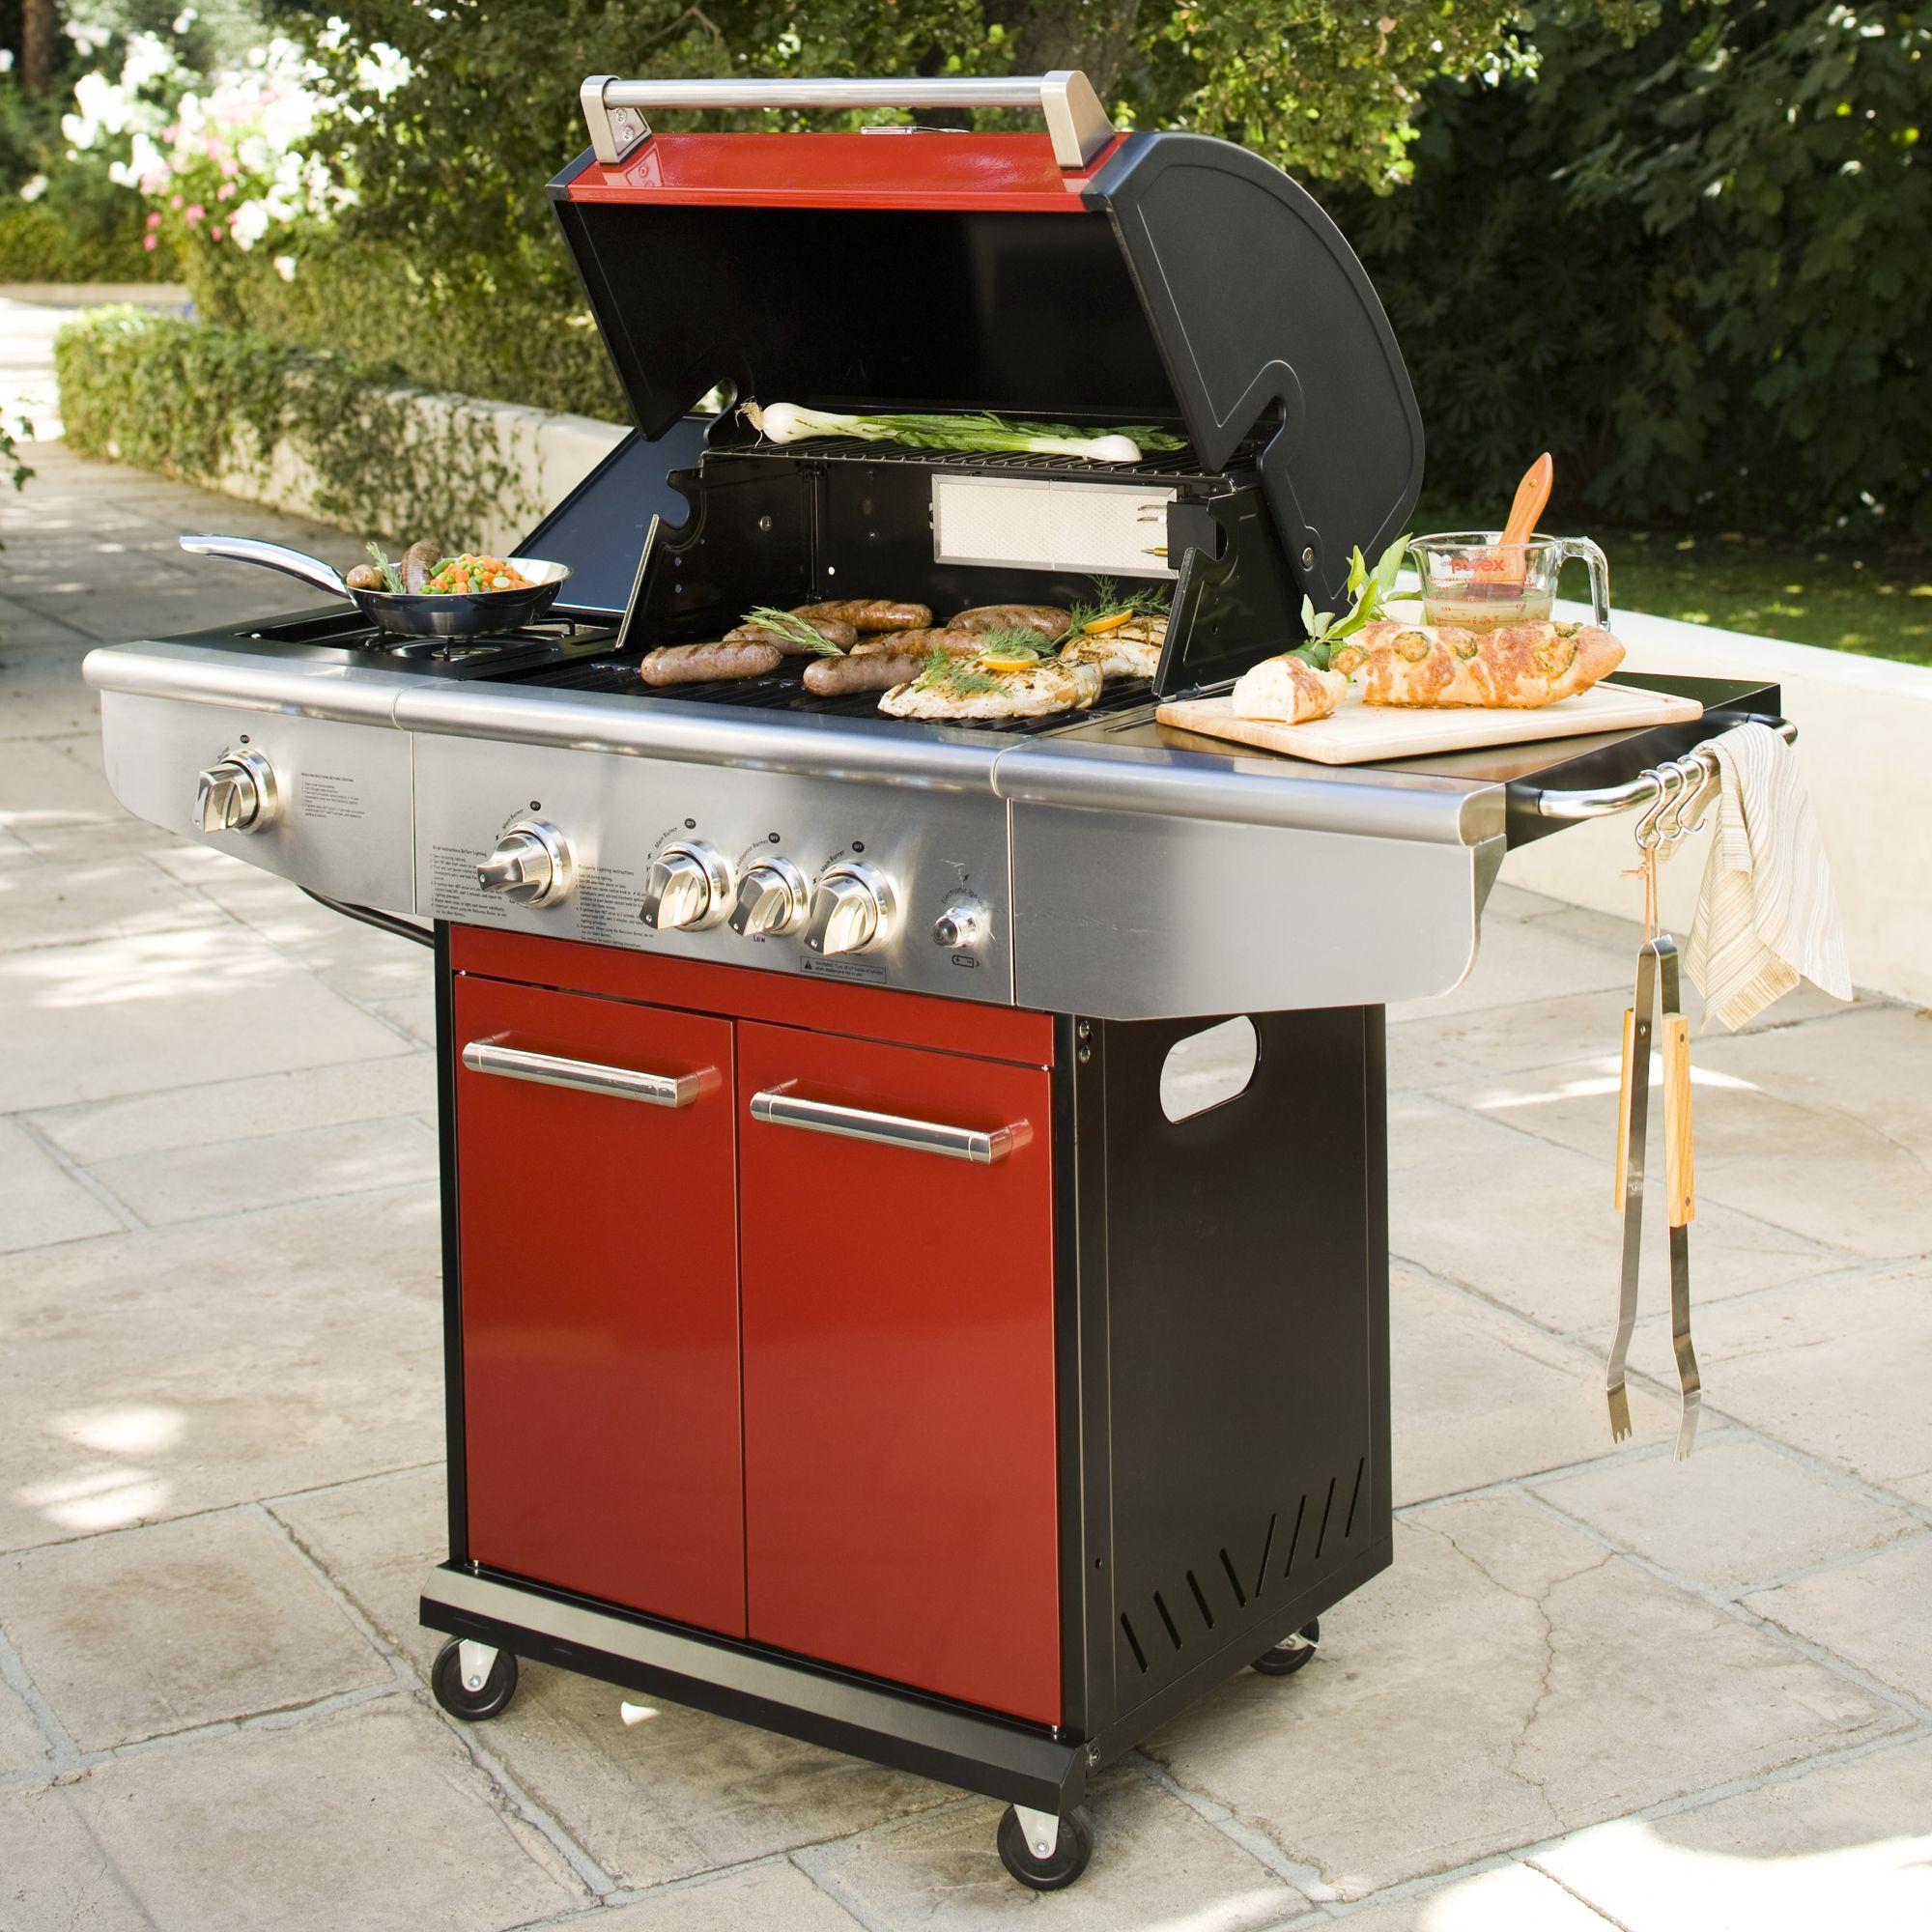 Kenmore 3-Burner Gas Grill with Back Burner - Red